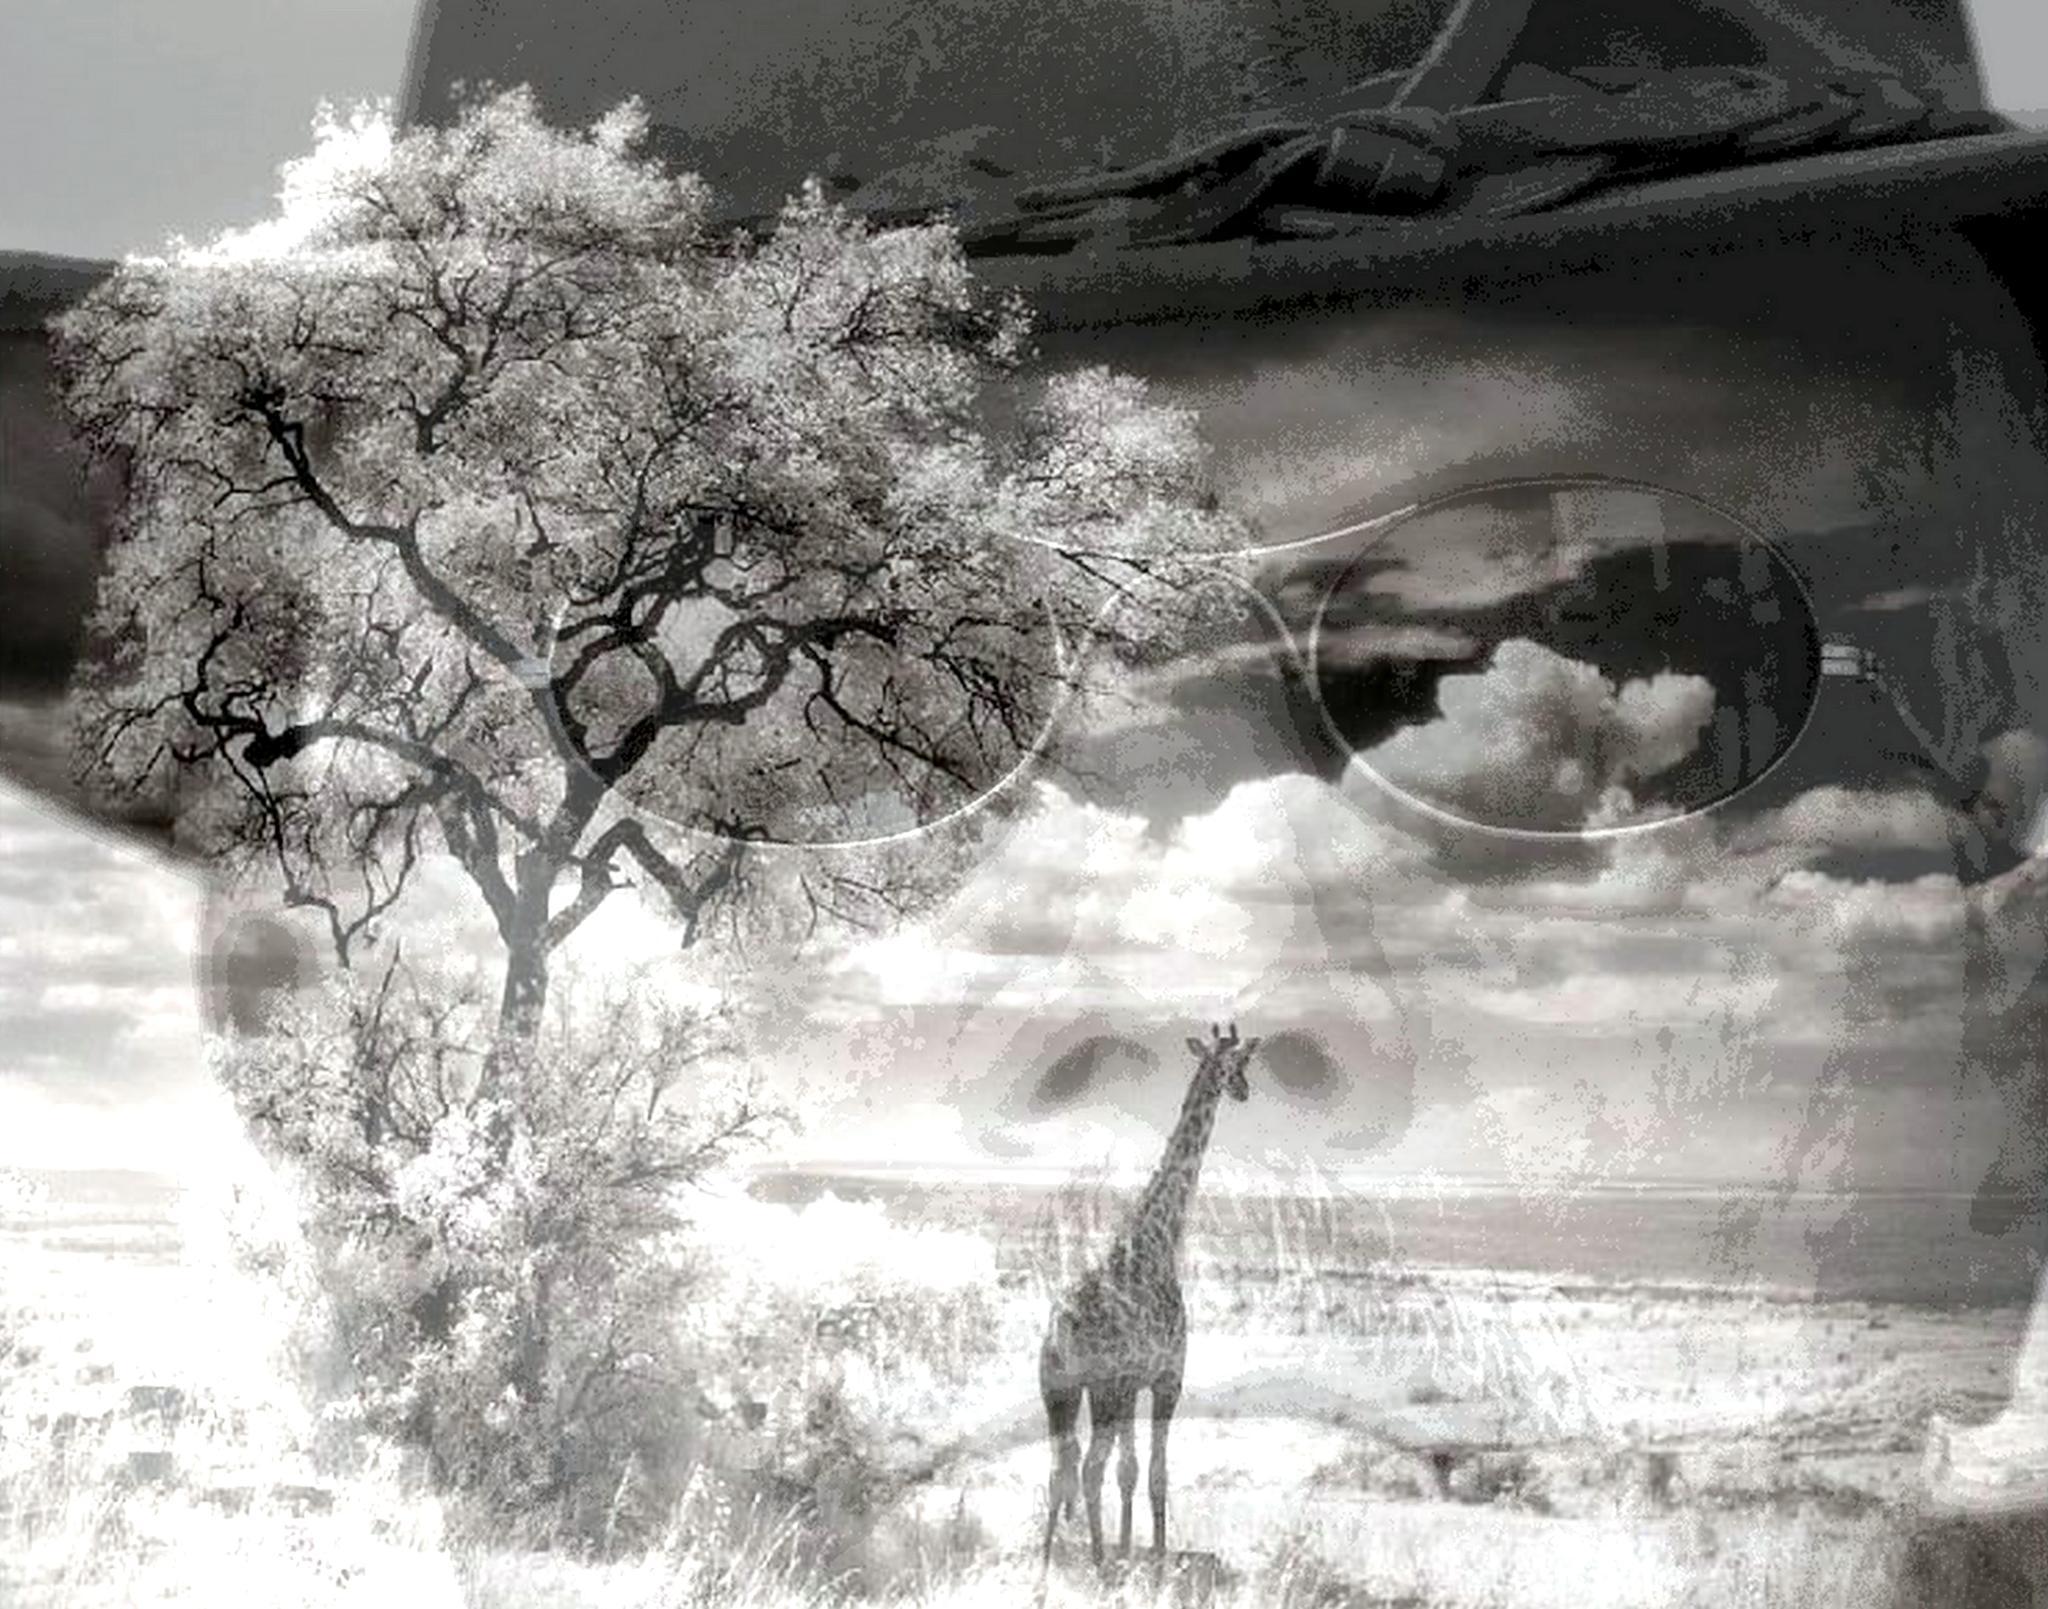 Africa by mpross1